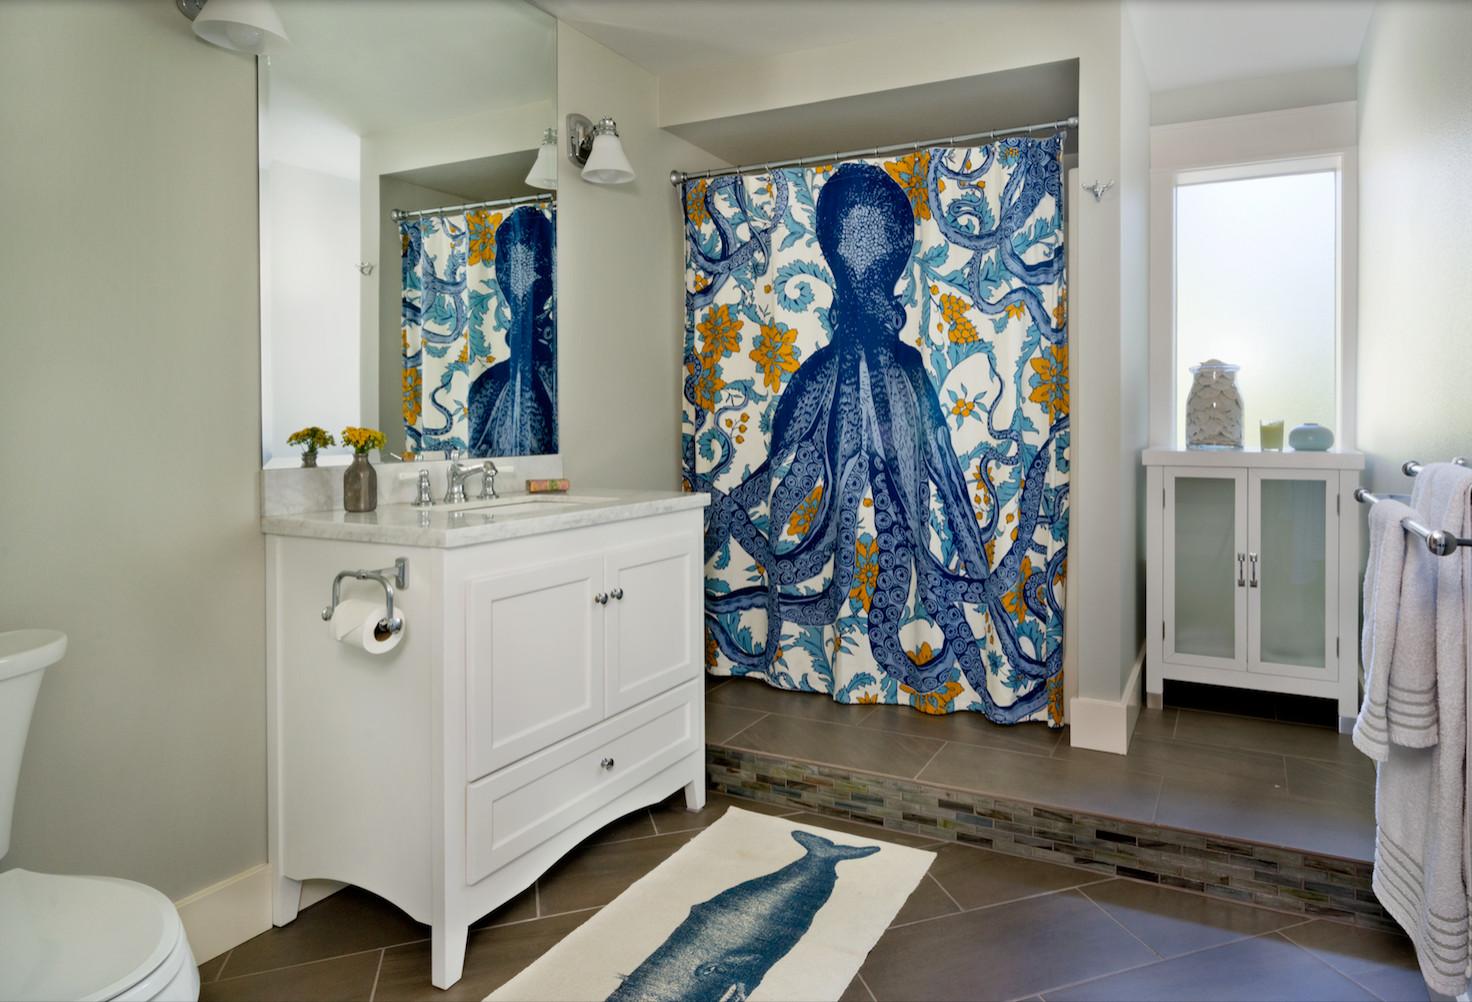 Lake House Design by Lori Brock